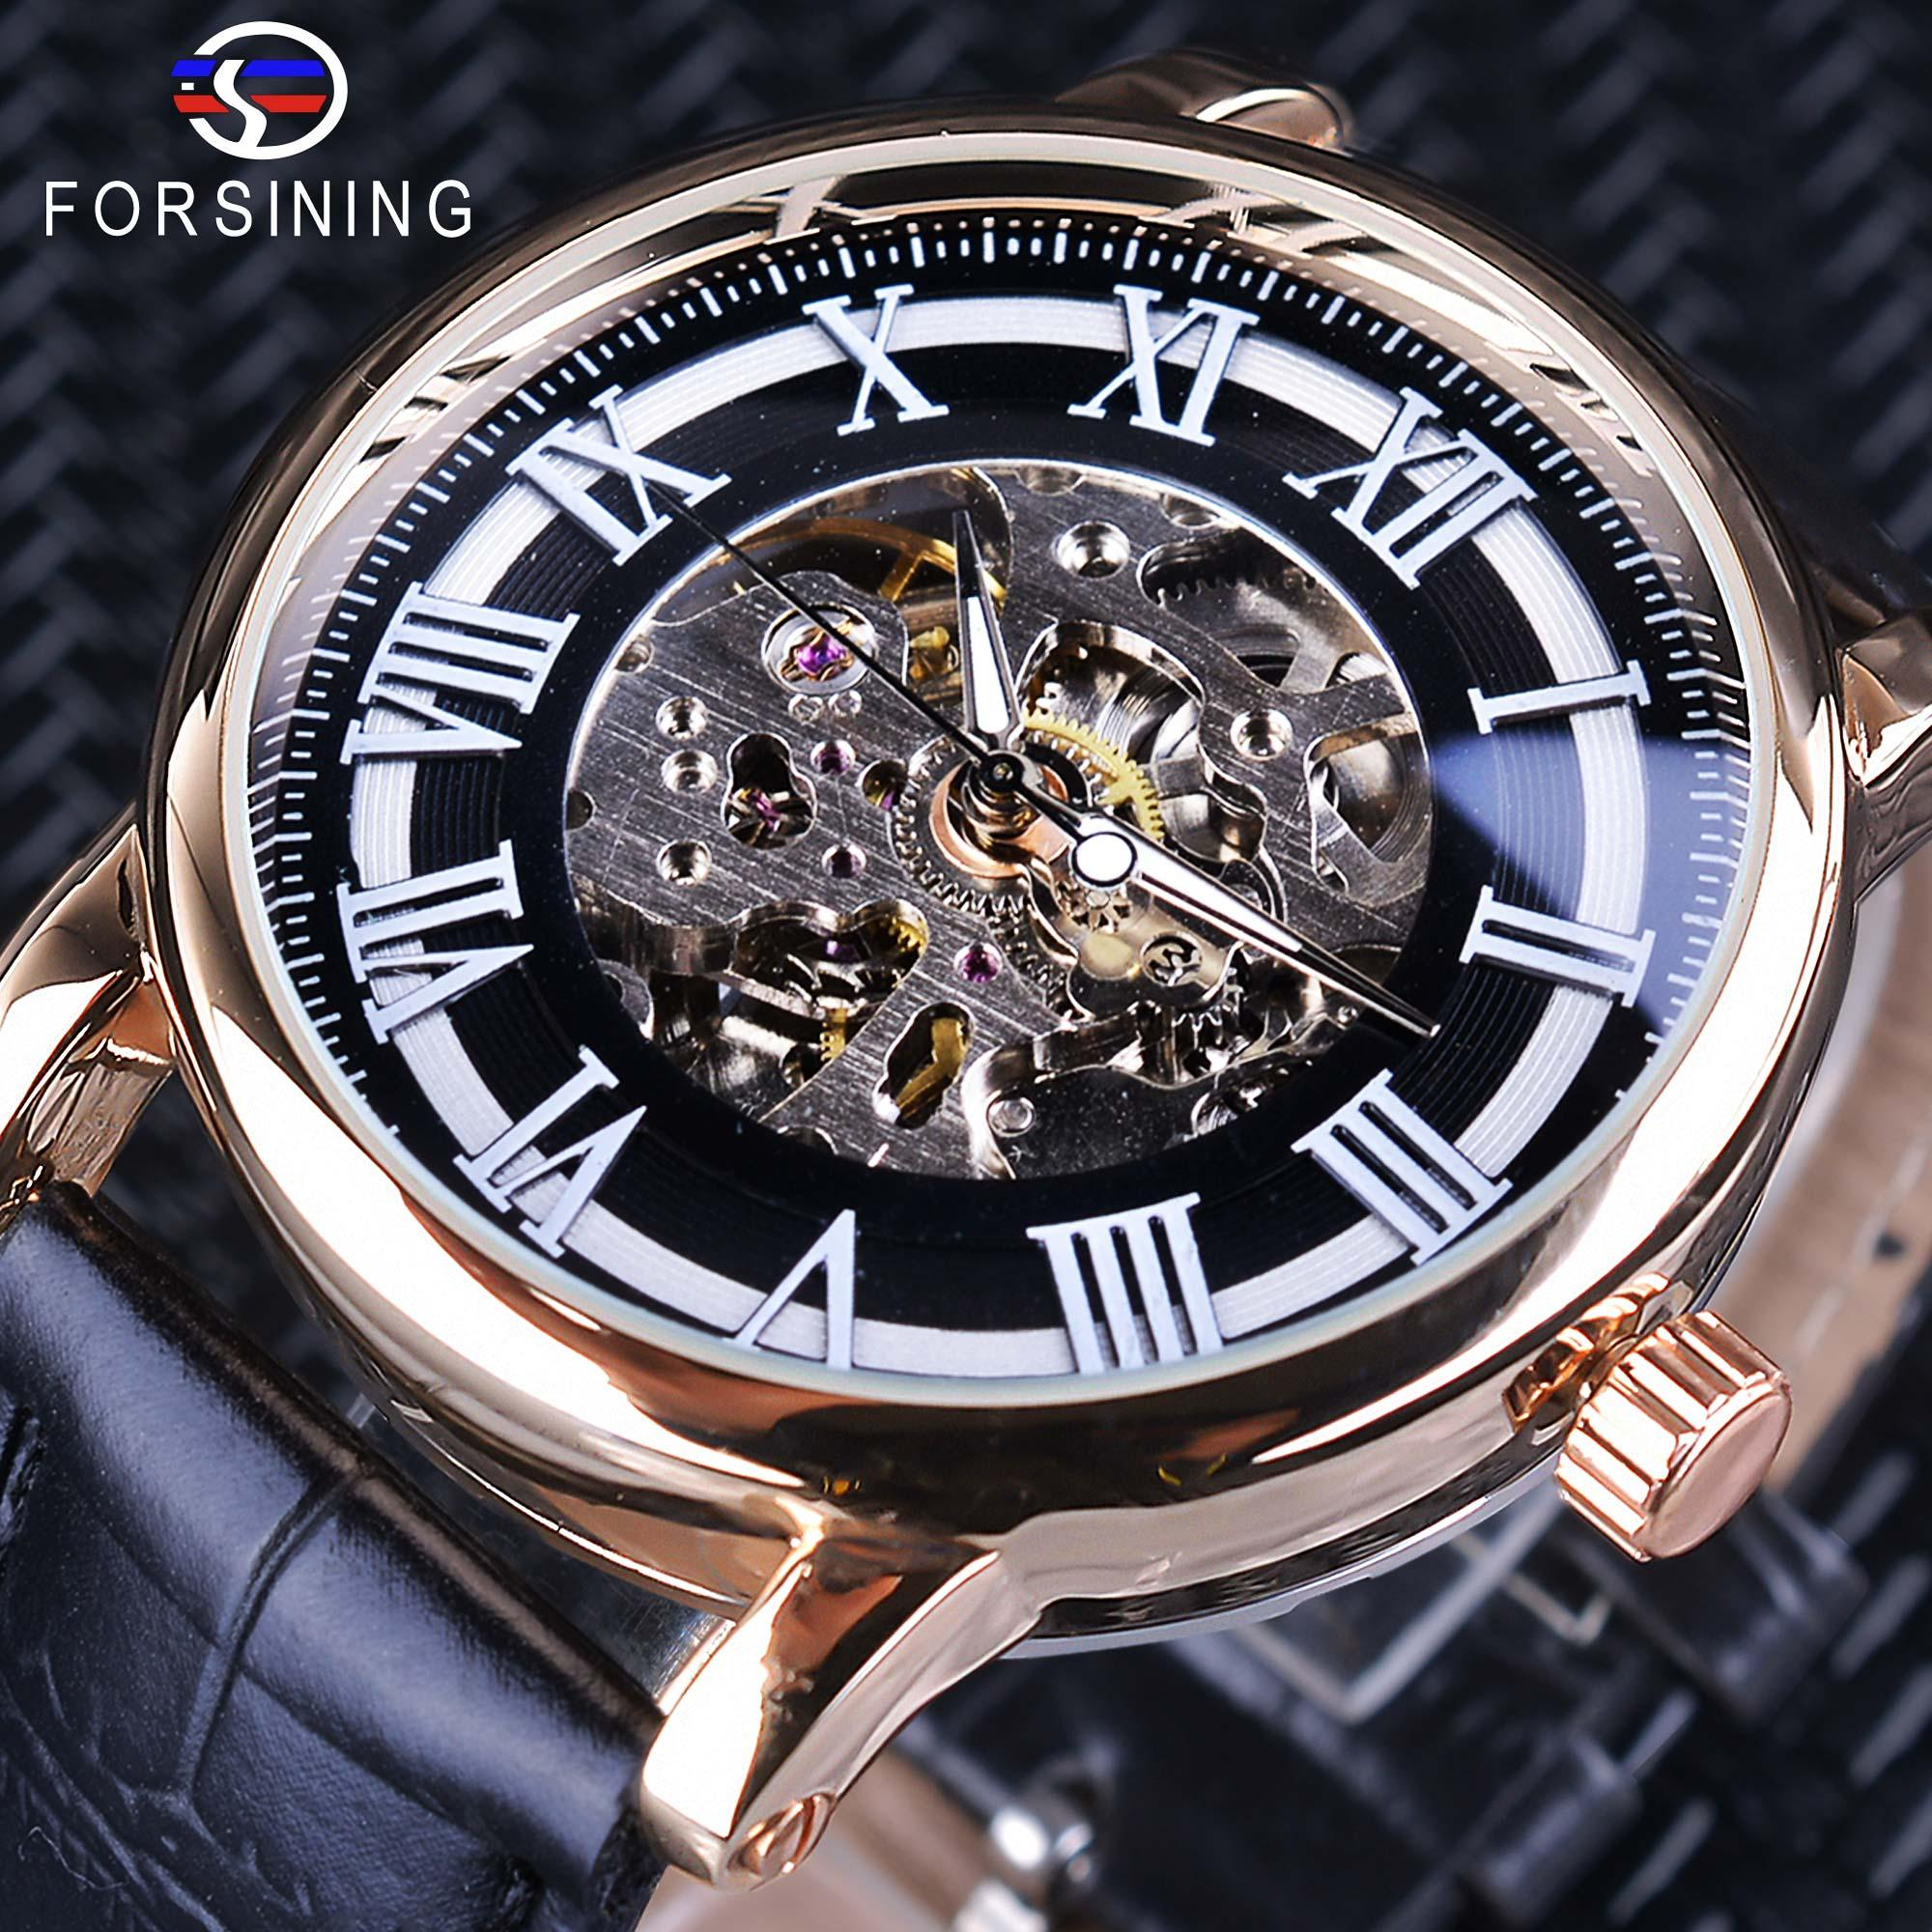 7d35e8b37a9 Compre Forsining 2018 Relógios Automáticos Dos Homens Romanos Retro Top  Marca De Luxo Esqueleto Preto Luminoso Relógio De Pulso Relógio Masculino  Relógio ...